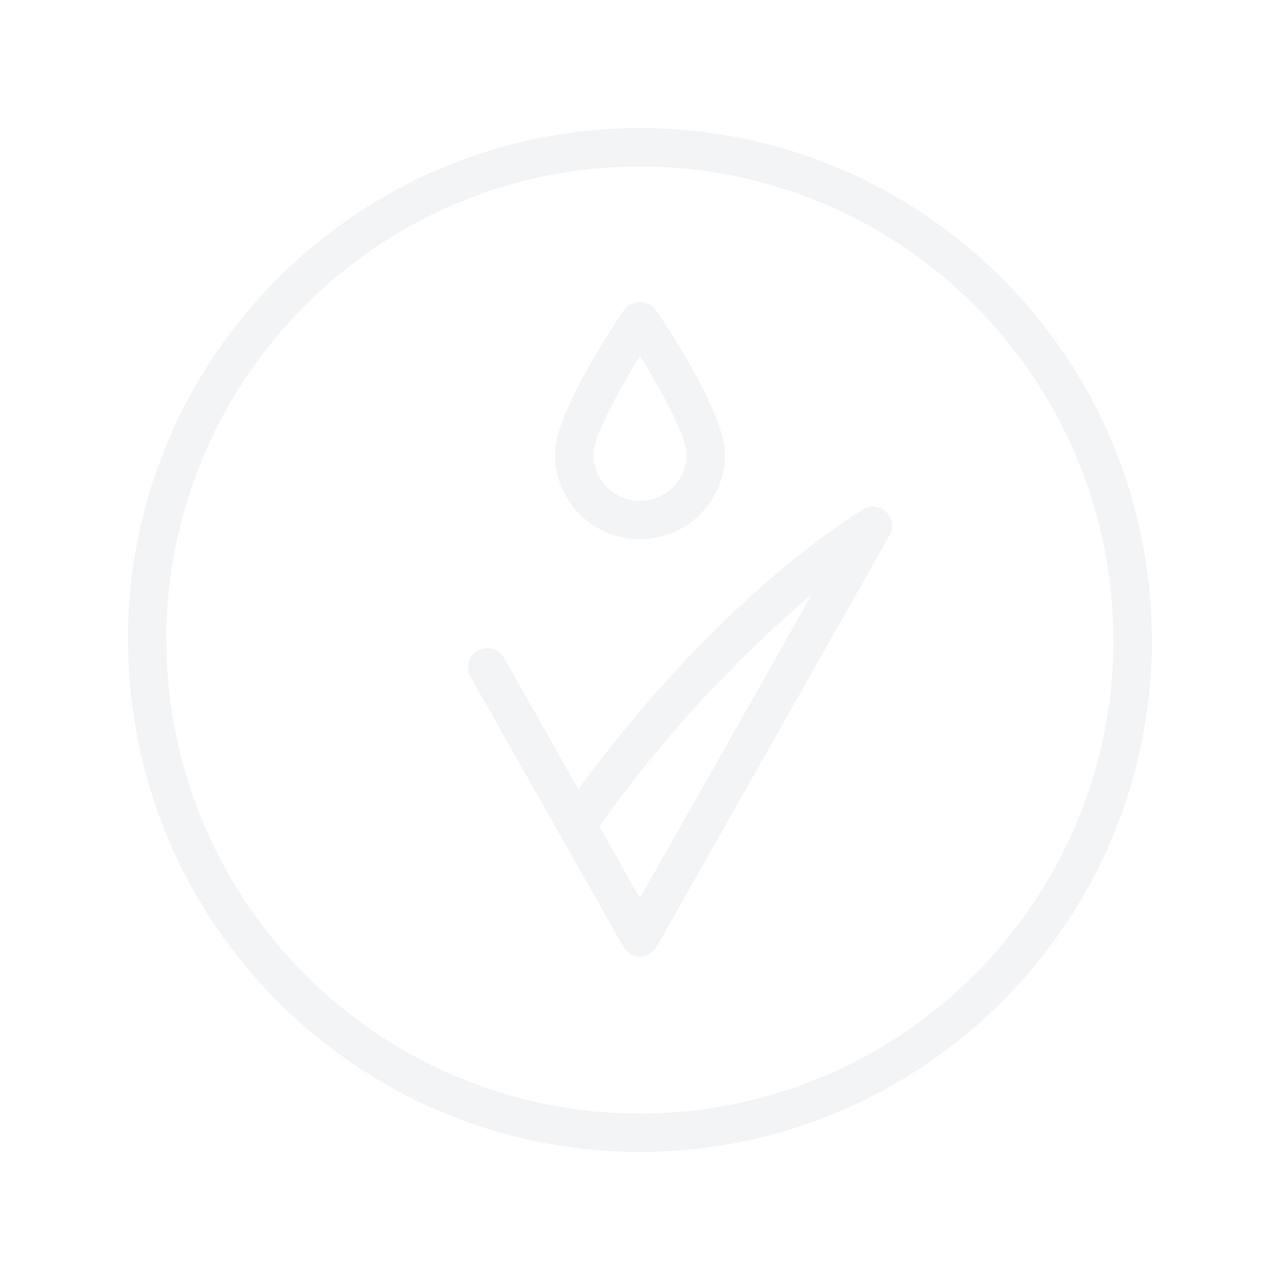 ALESSANDRO Nail Polish No.31 Girly Flush 5ml